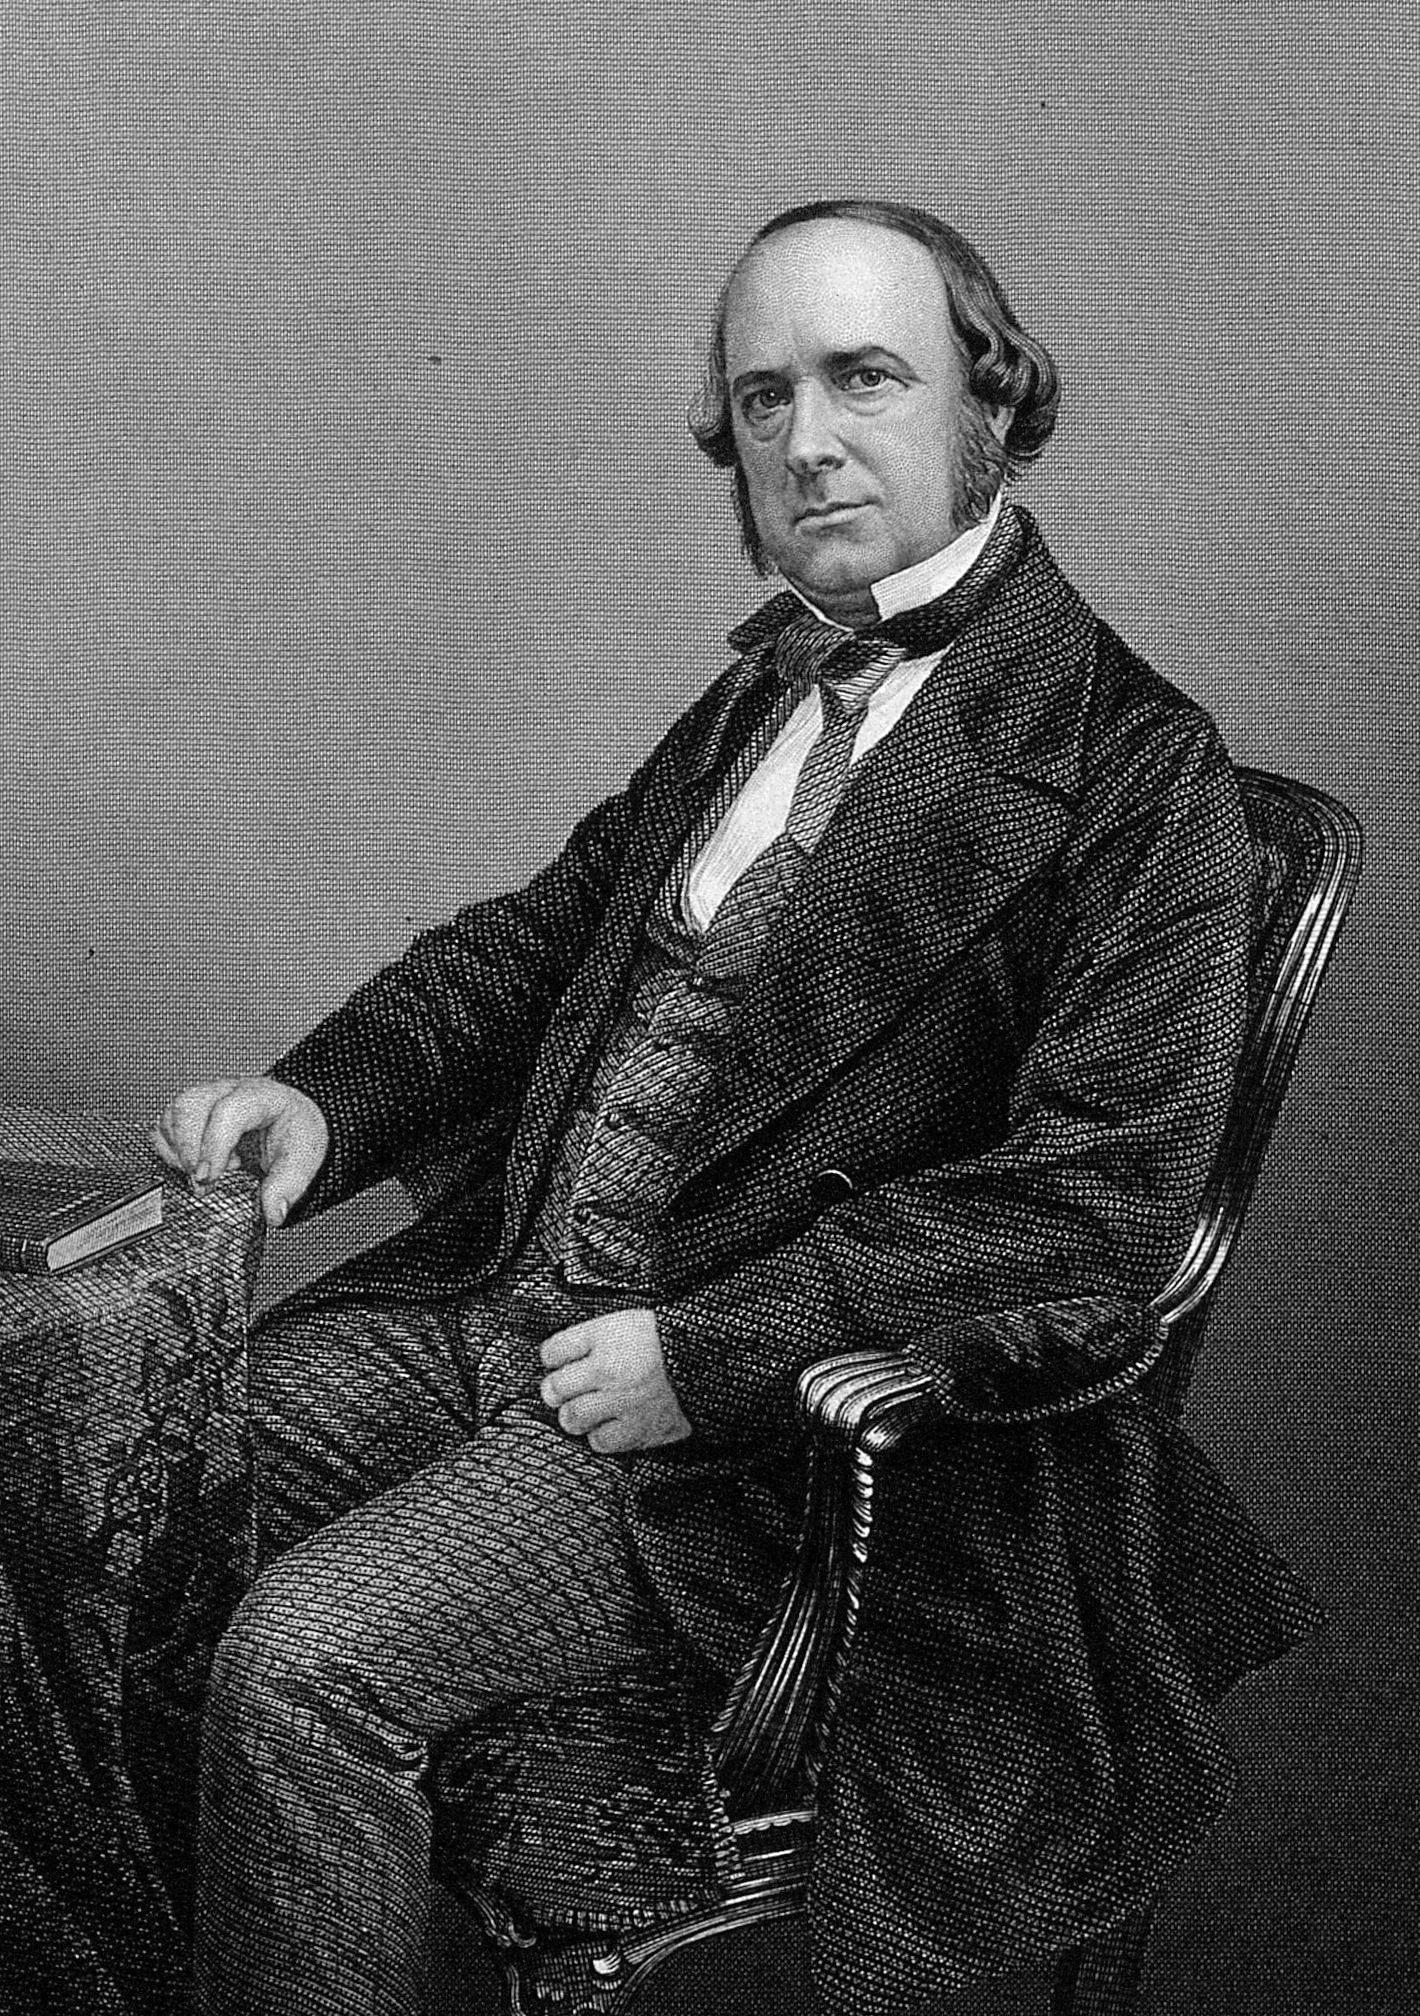 Thomas Wright c. 1859